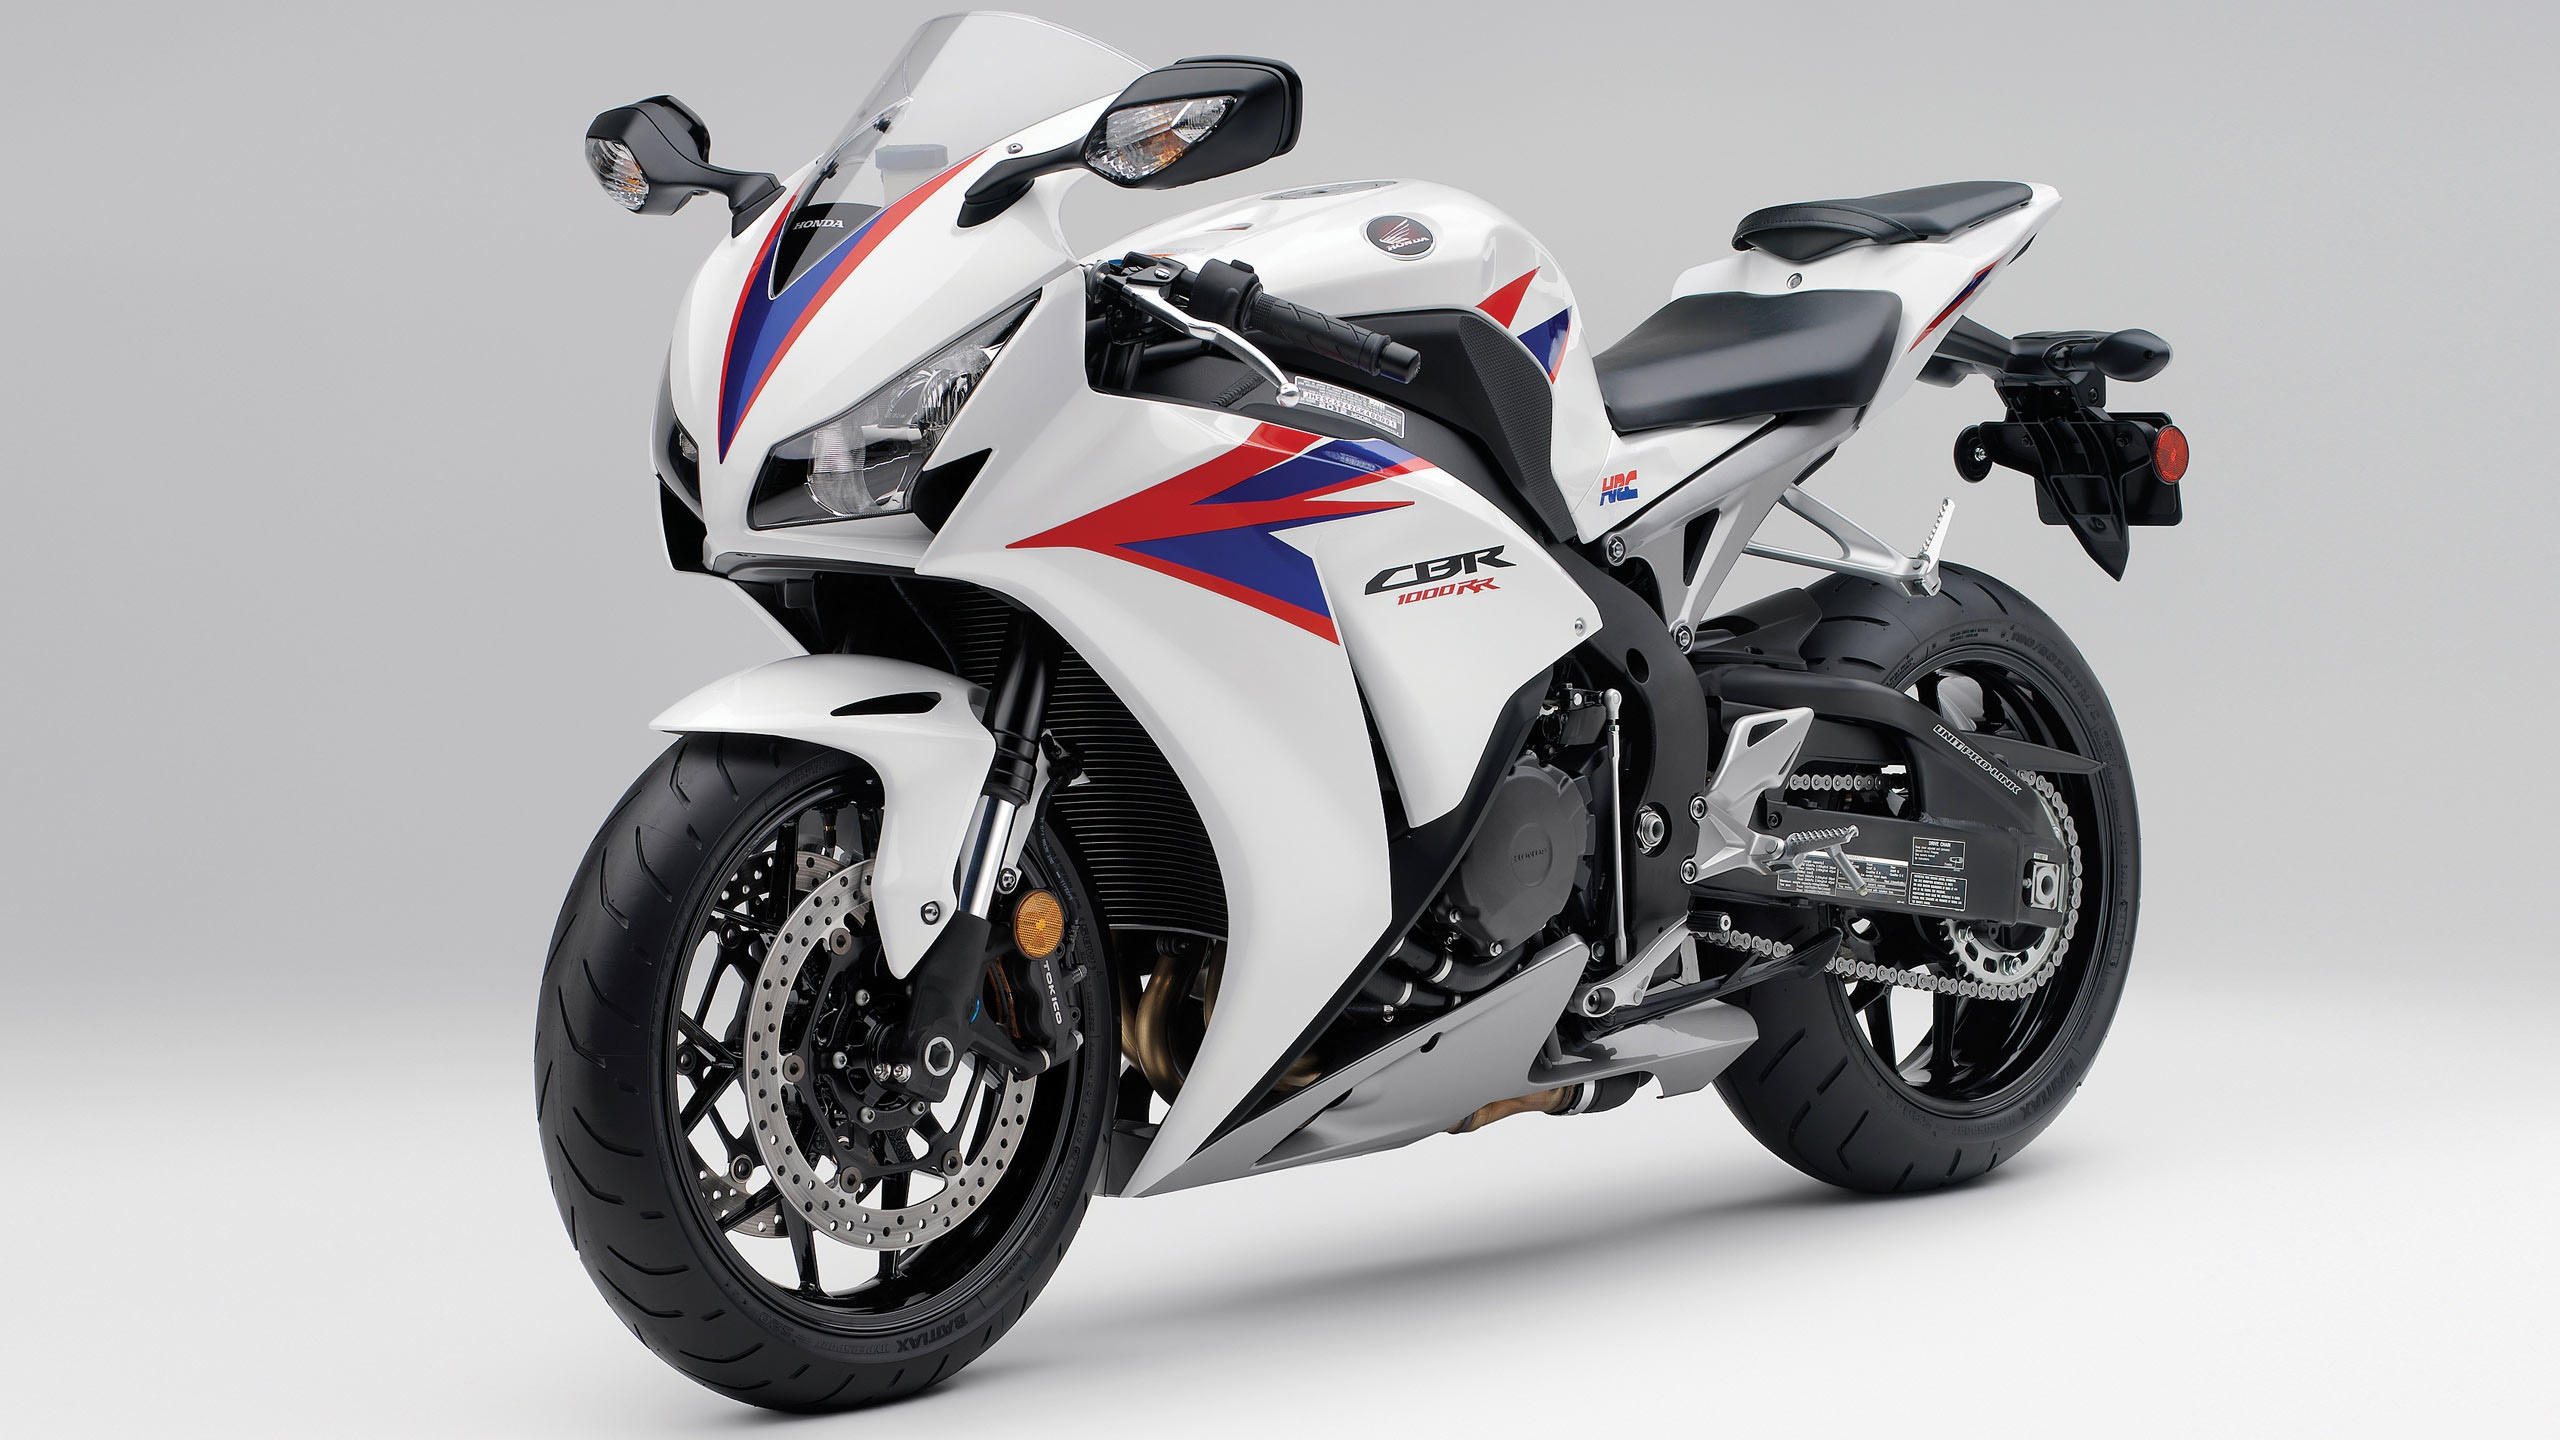 Honda Cbr1000 Rr バイク かっこいいバイク2012 Naver まとめ